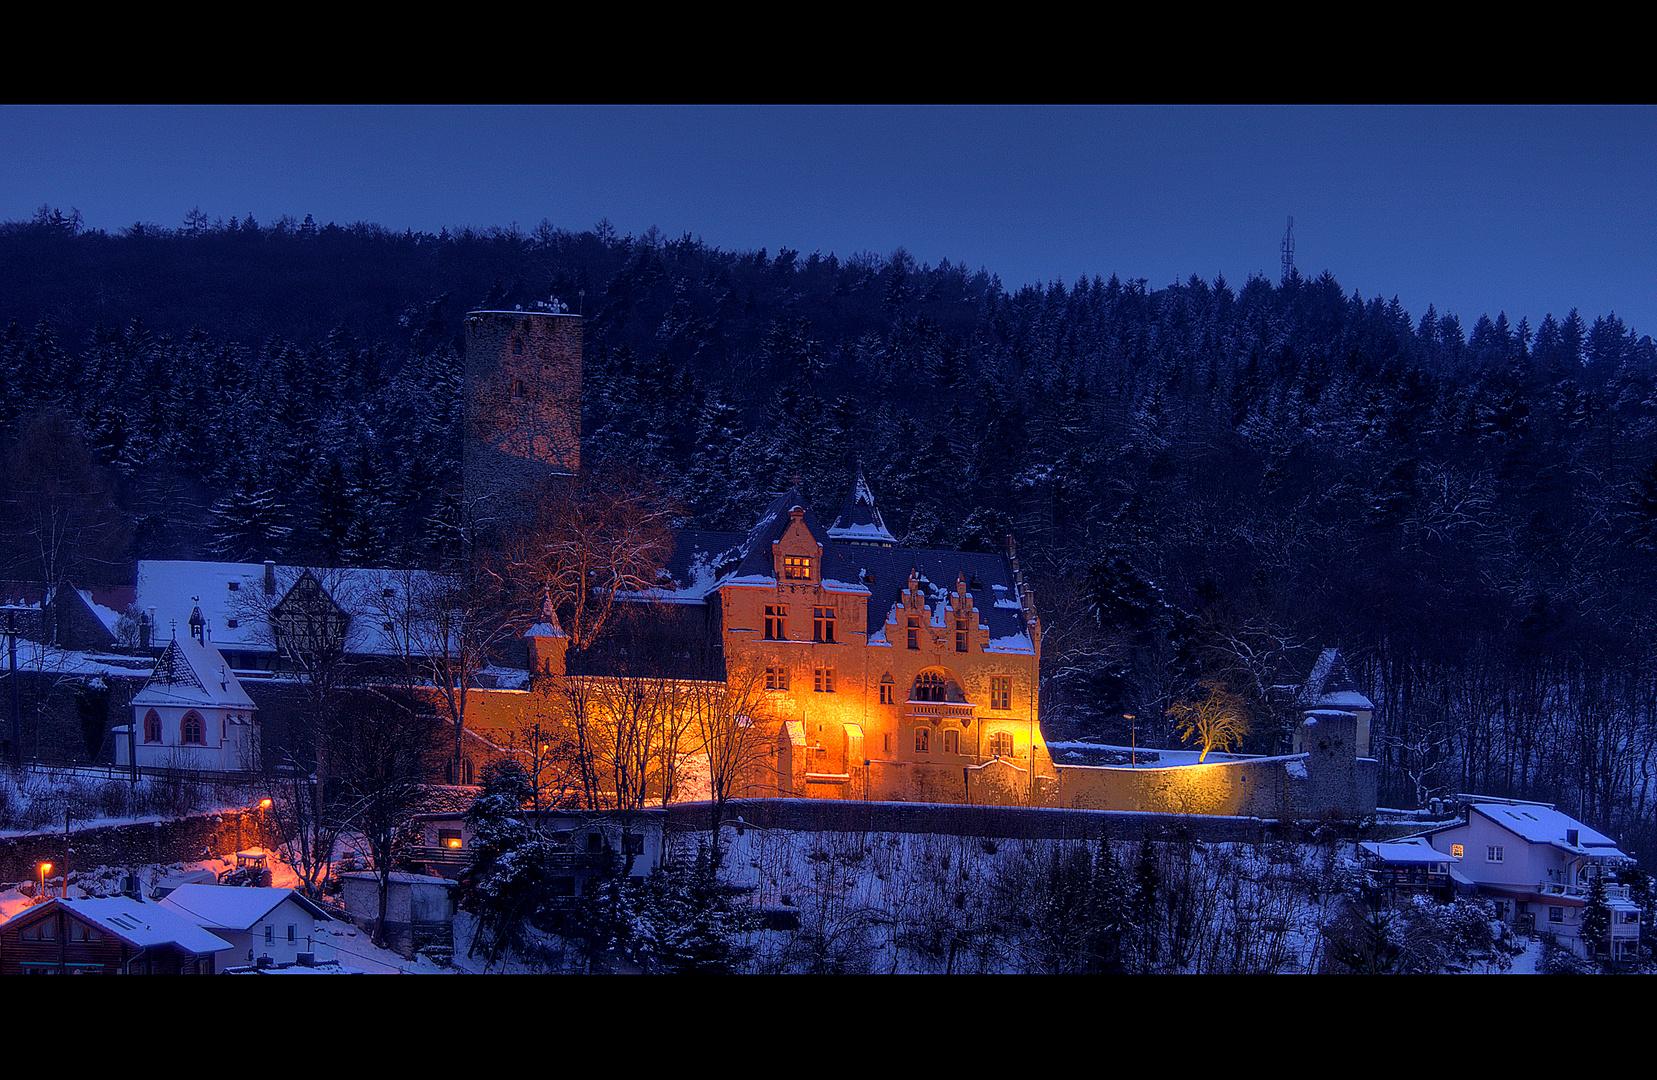 31.12.2010 Schloss Kransberg